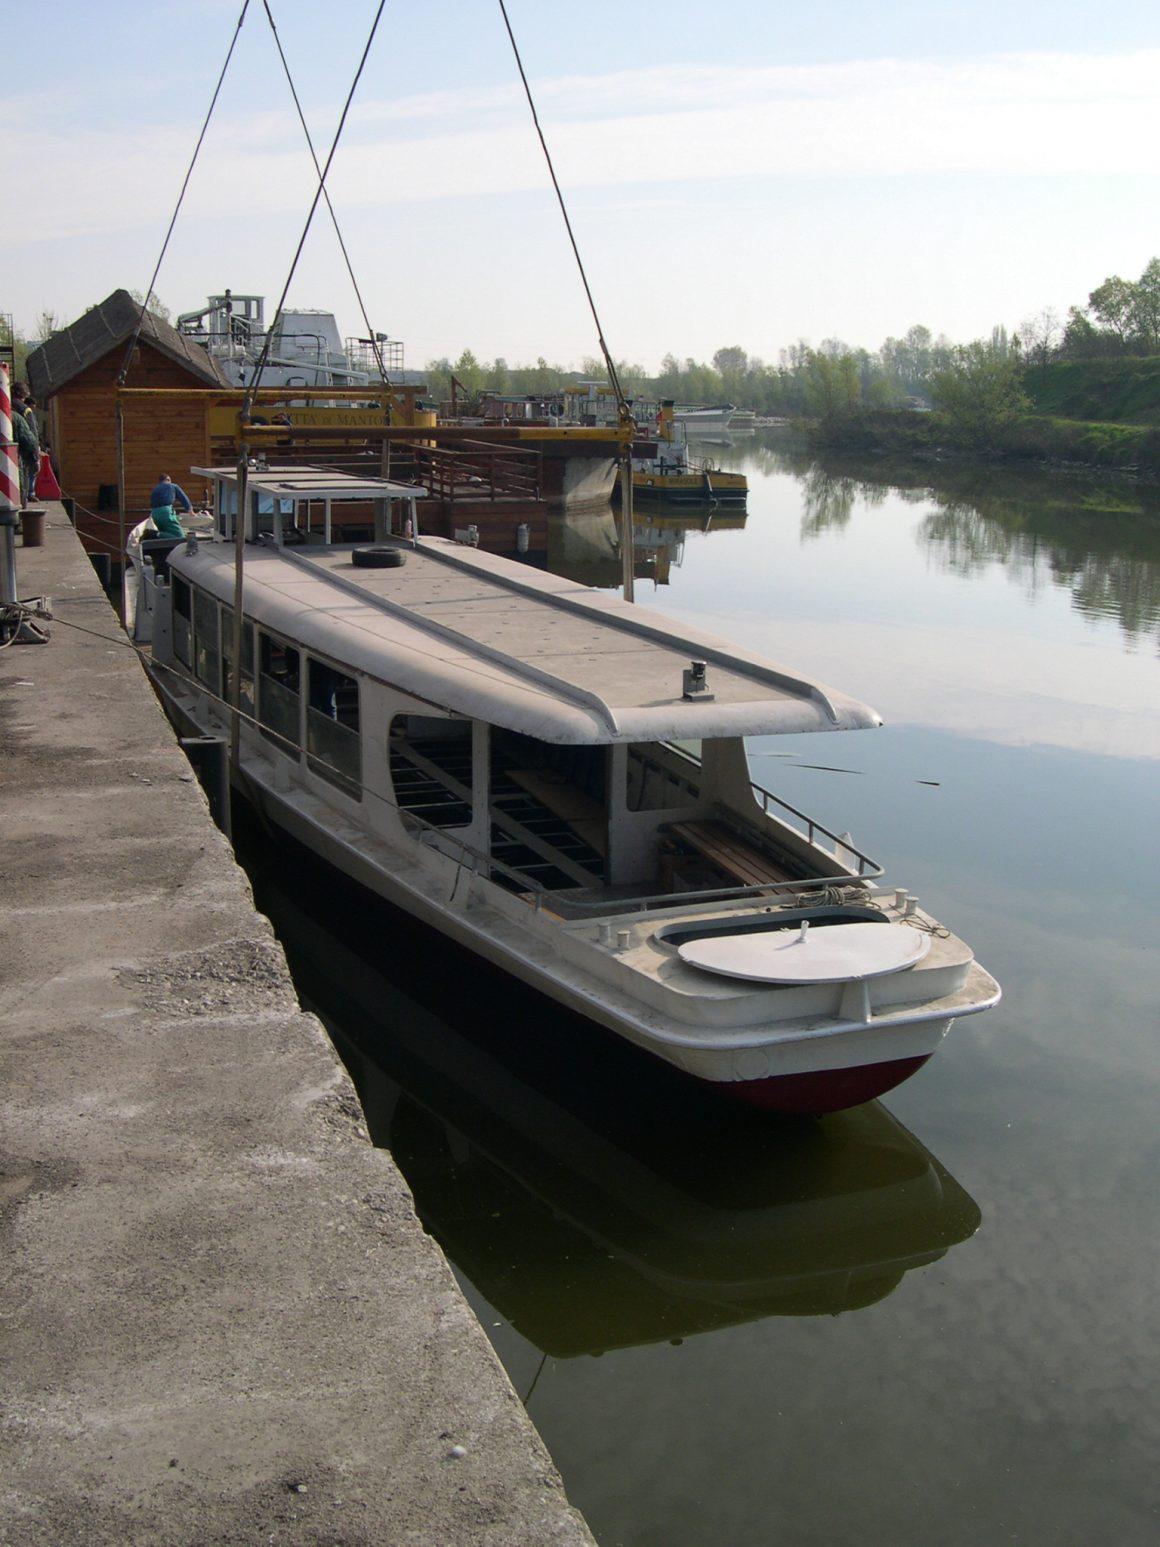 Varo di una nave vergine